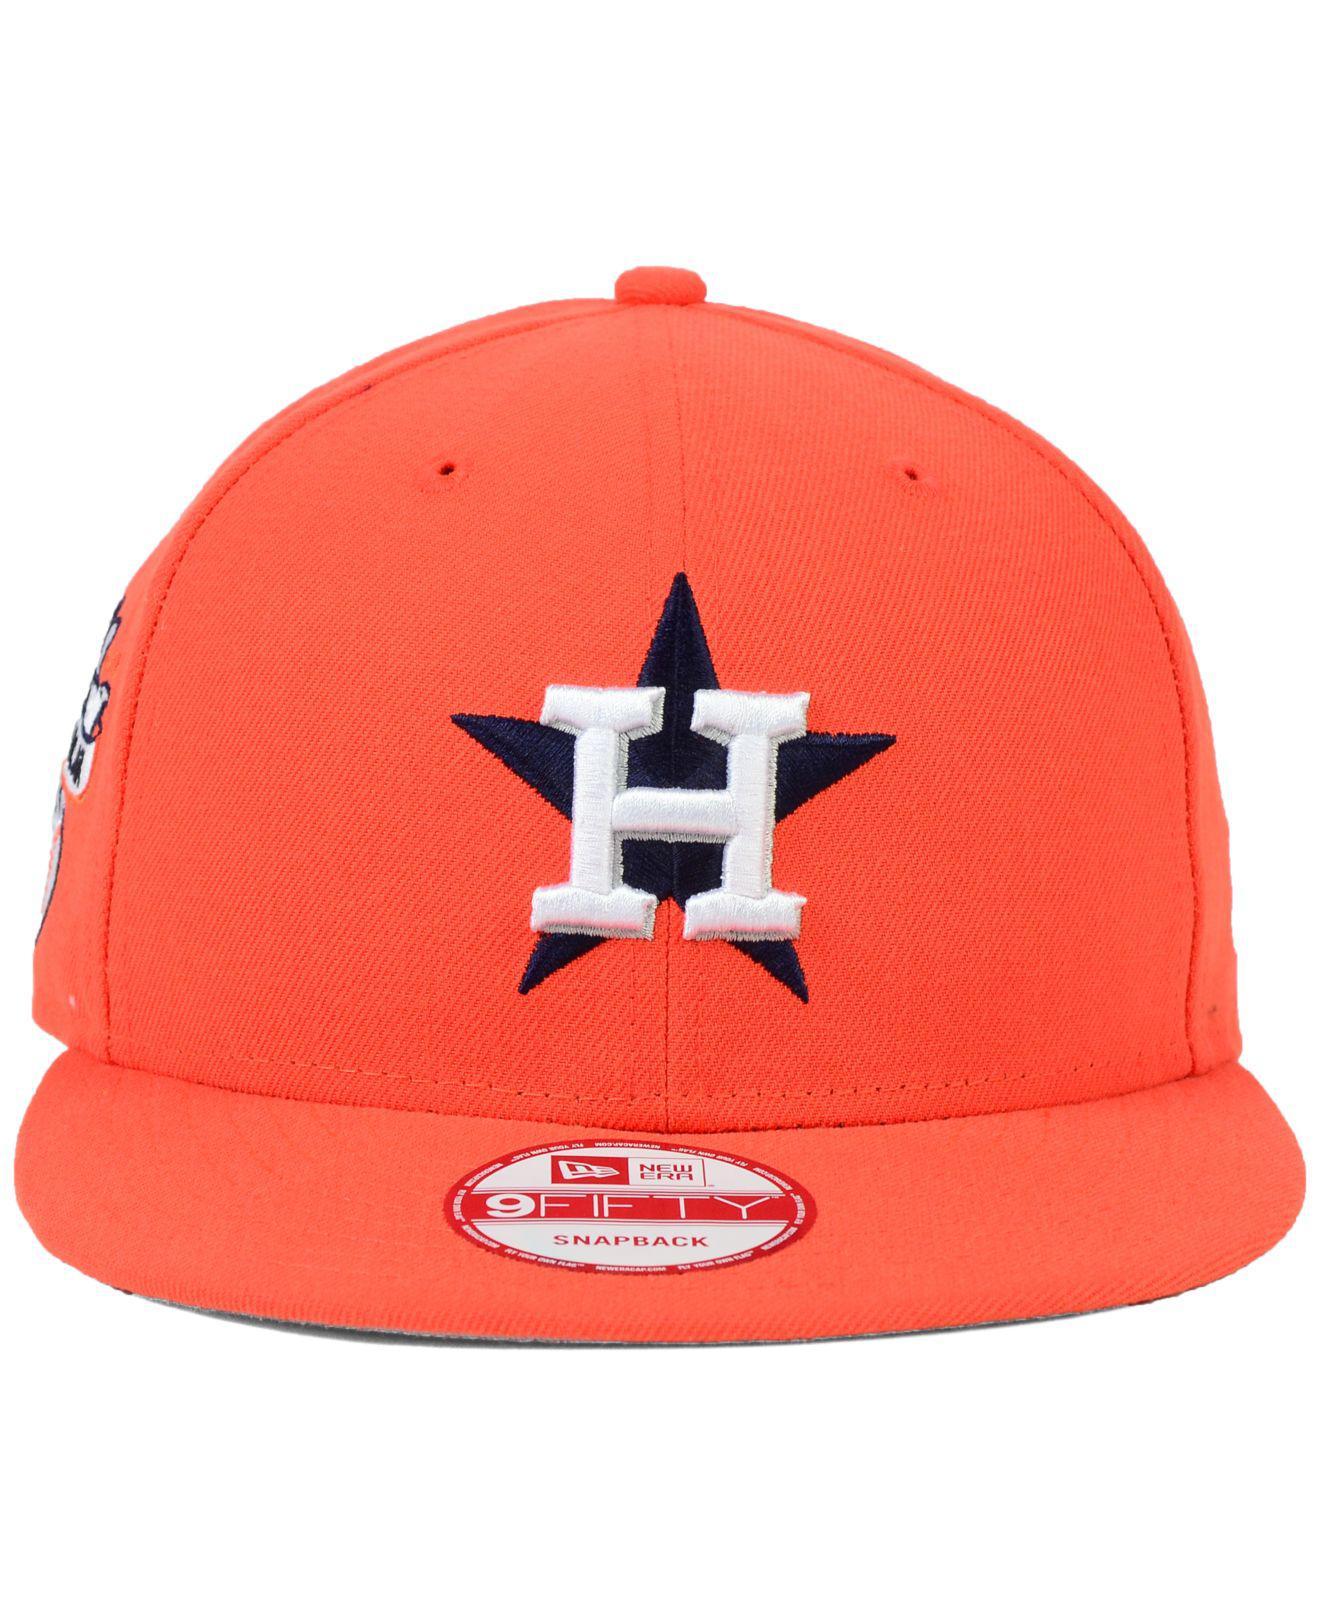 cheap for discount 2d651 9f3de Lyst - KTZ Houston Astros 2 Tone Link 9fifty Snapback Cap in Orange for Men